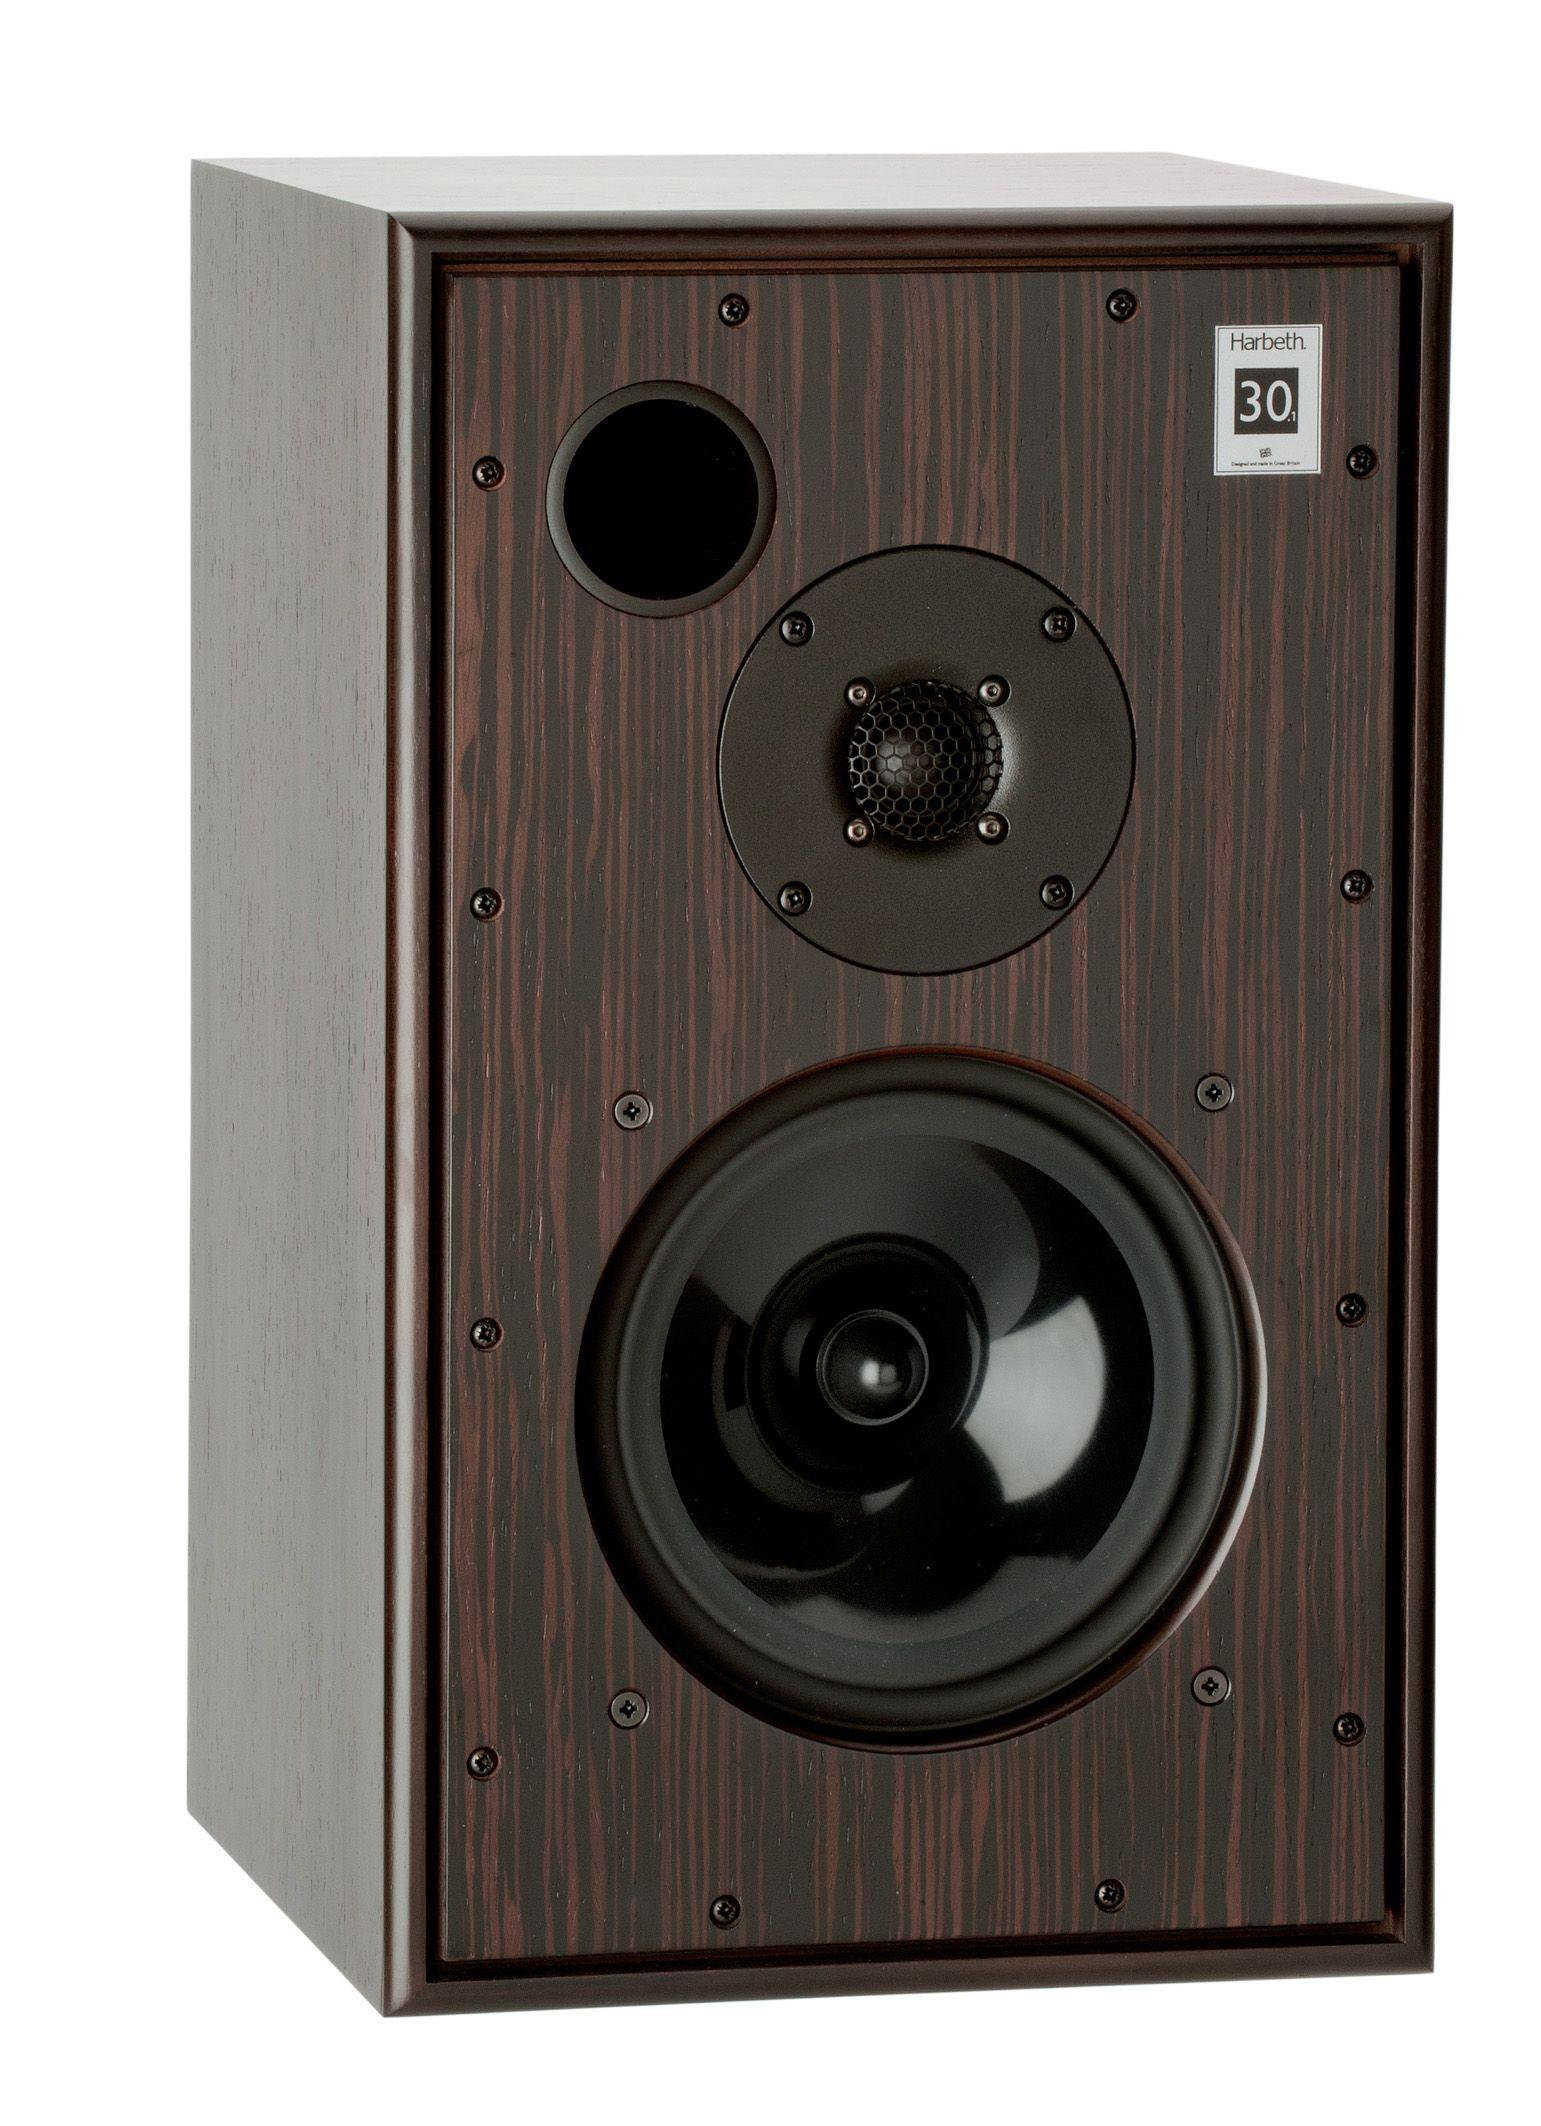 Monitor 30 1 Audiofile Luidspreker